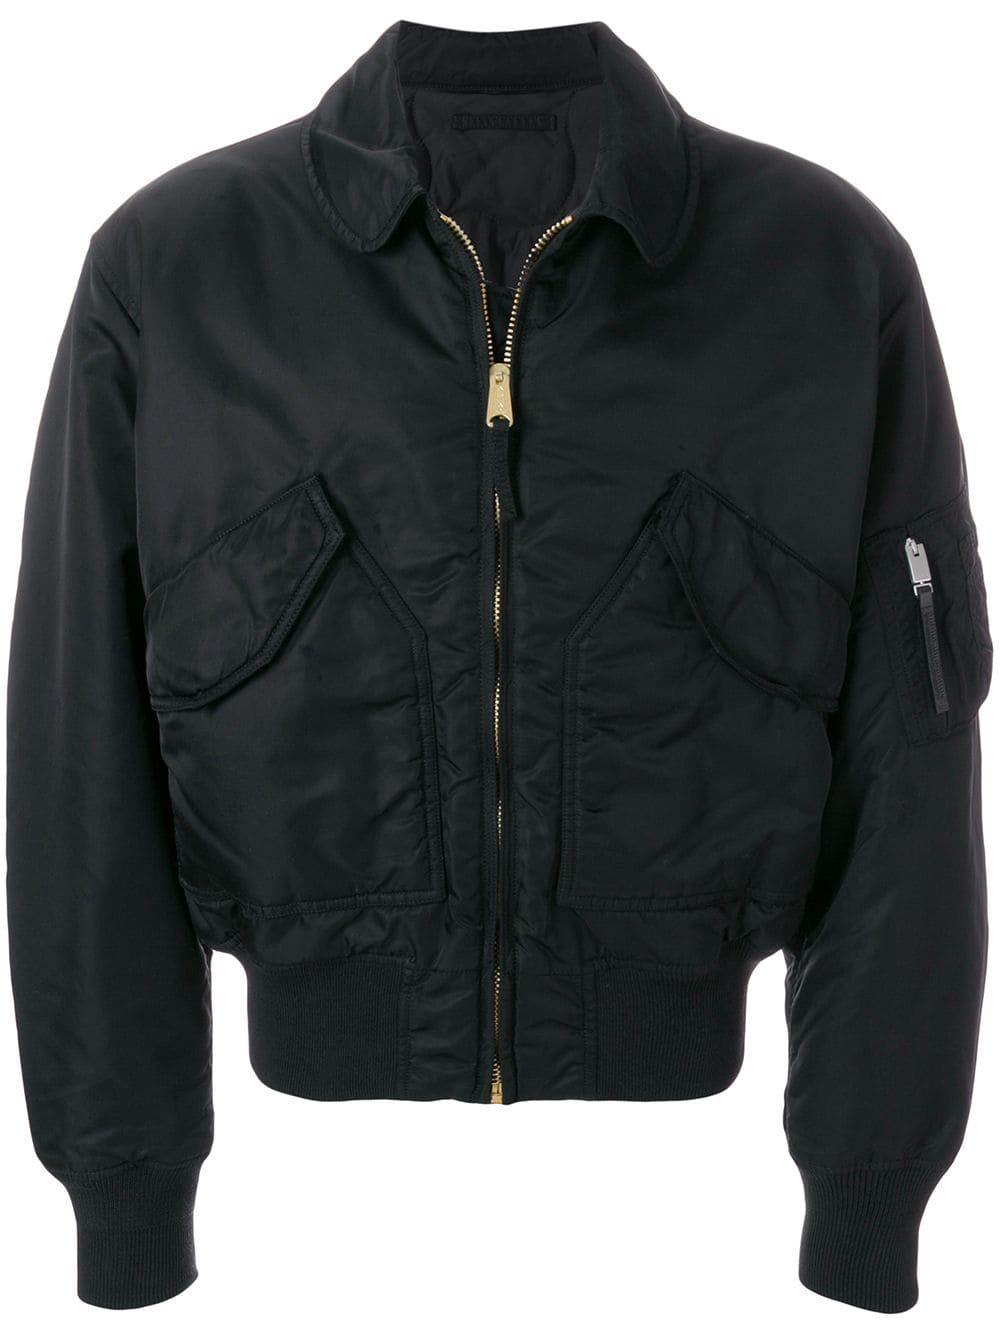 1017 Alyx 9sm X Alpha Pilot Jacket Farfetch Designer Jackets For Men 1017 Alyx 9sm Pilot Jacket [ 1334 x 1000 Pixel ]